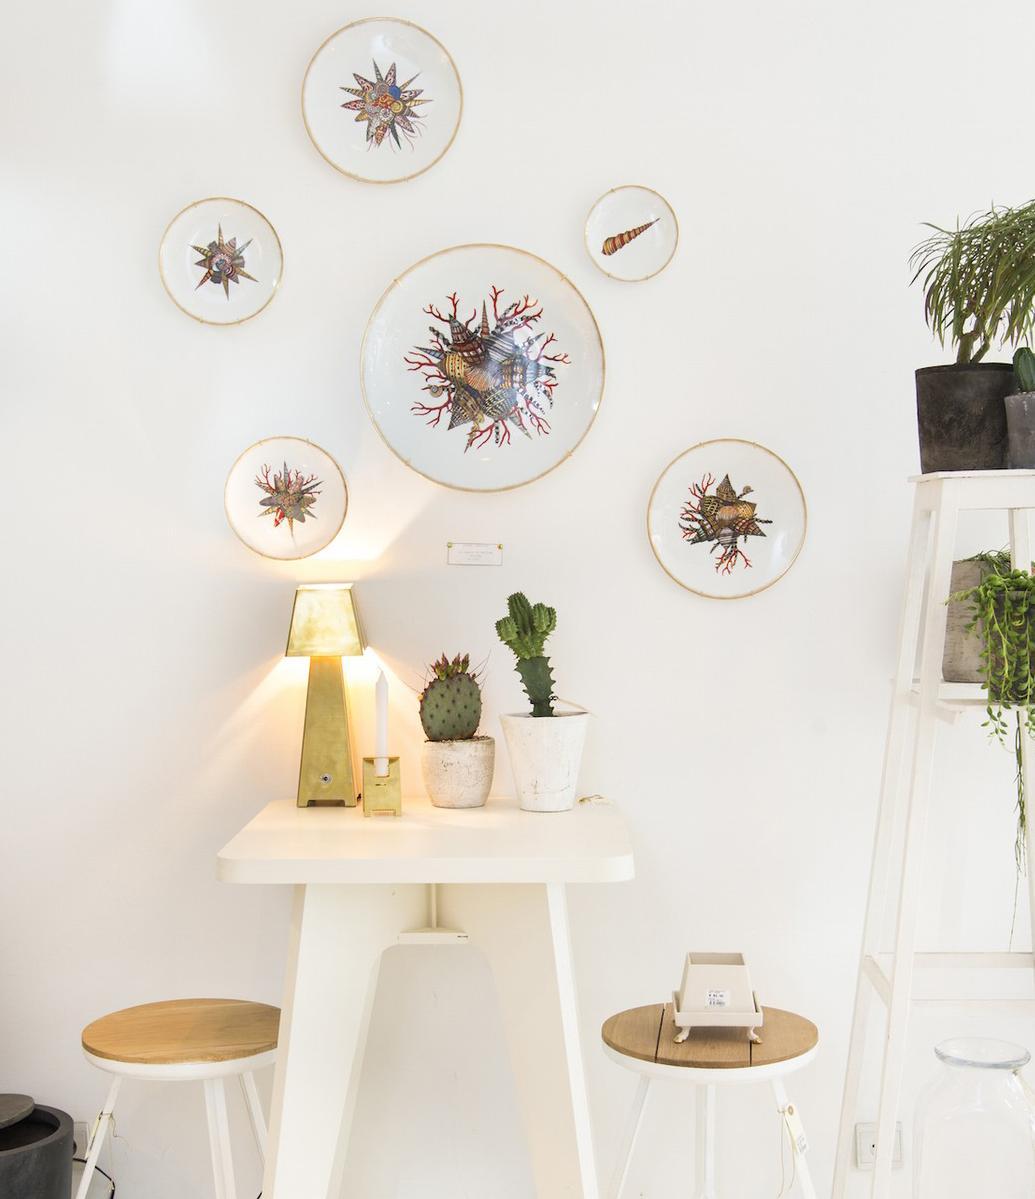 The Recollection, Antwerpen, Concept store, shoppen, deco